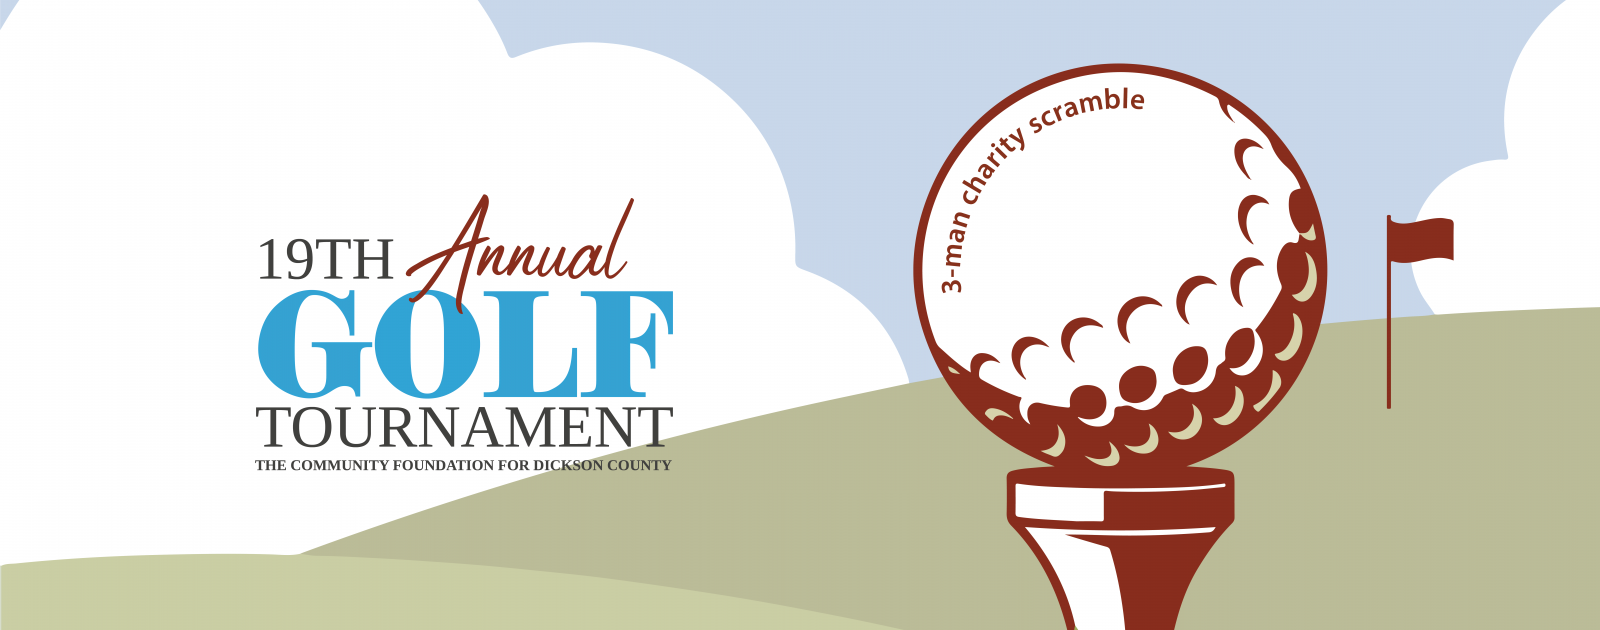 Dickson County Golf Tournament